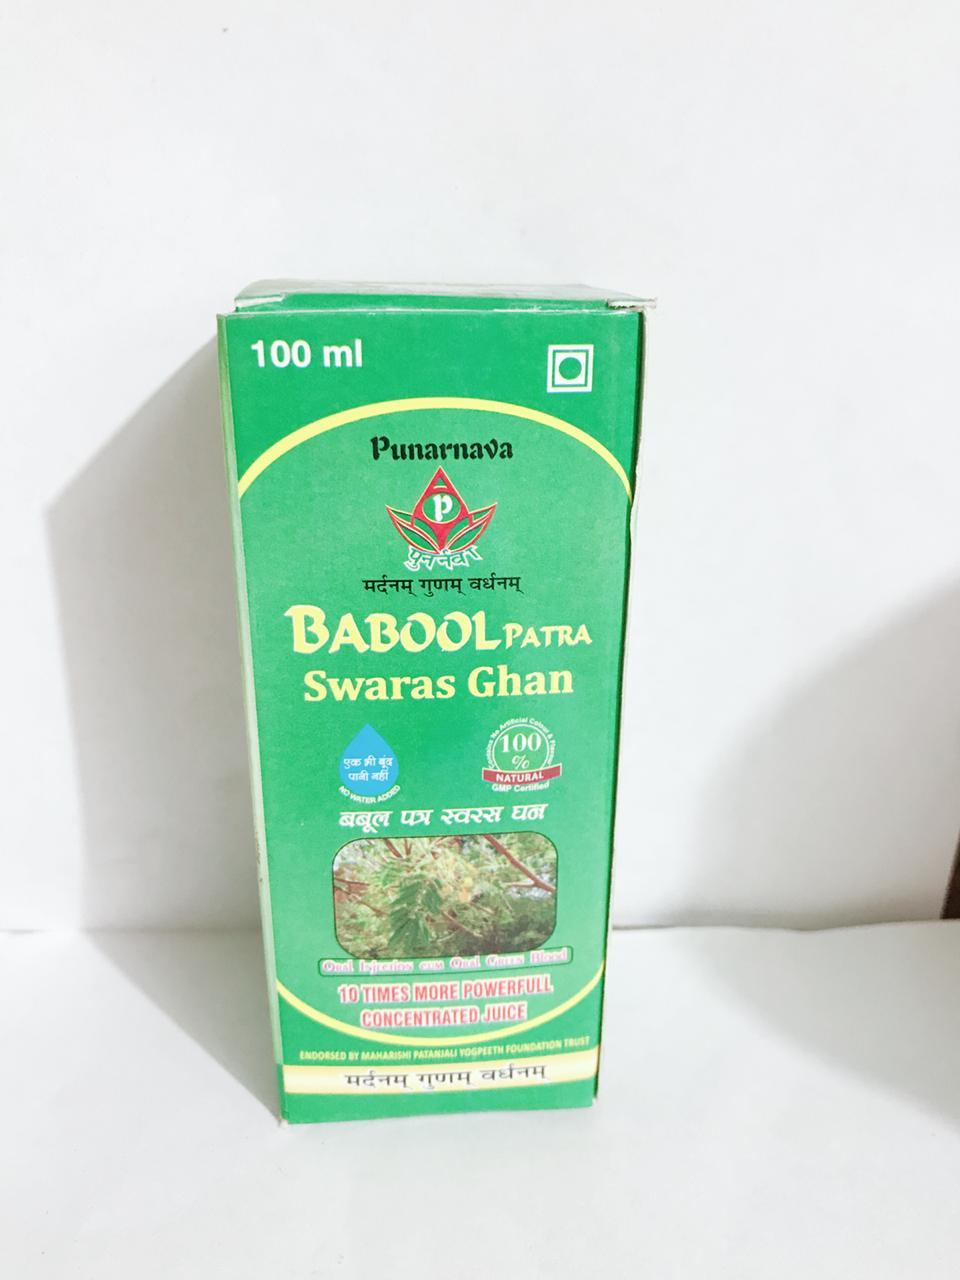 Babool Patra Swaras ghan